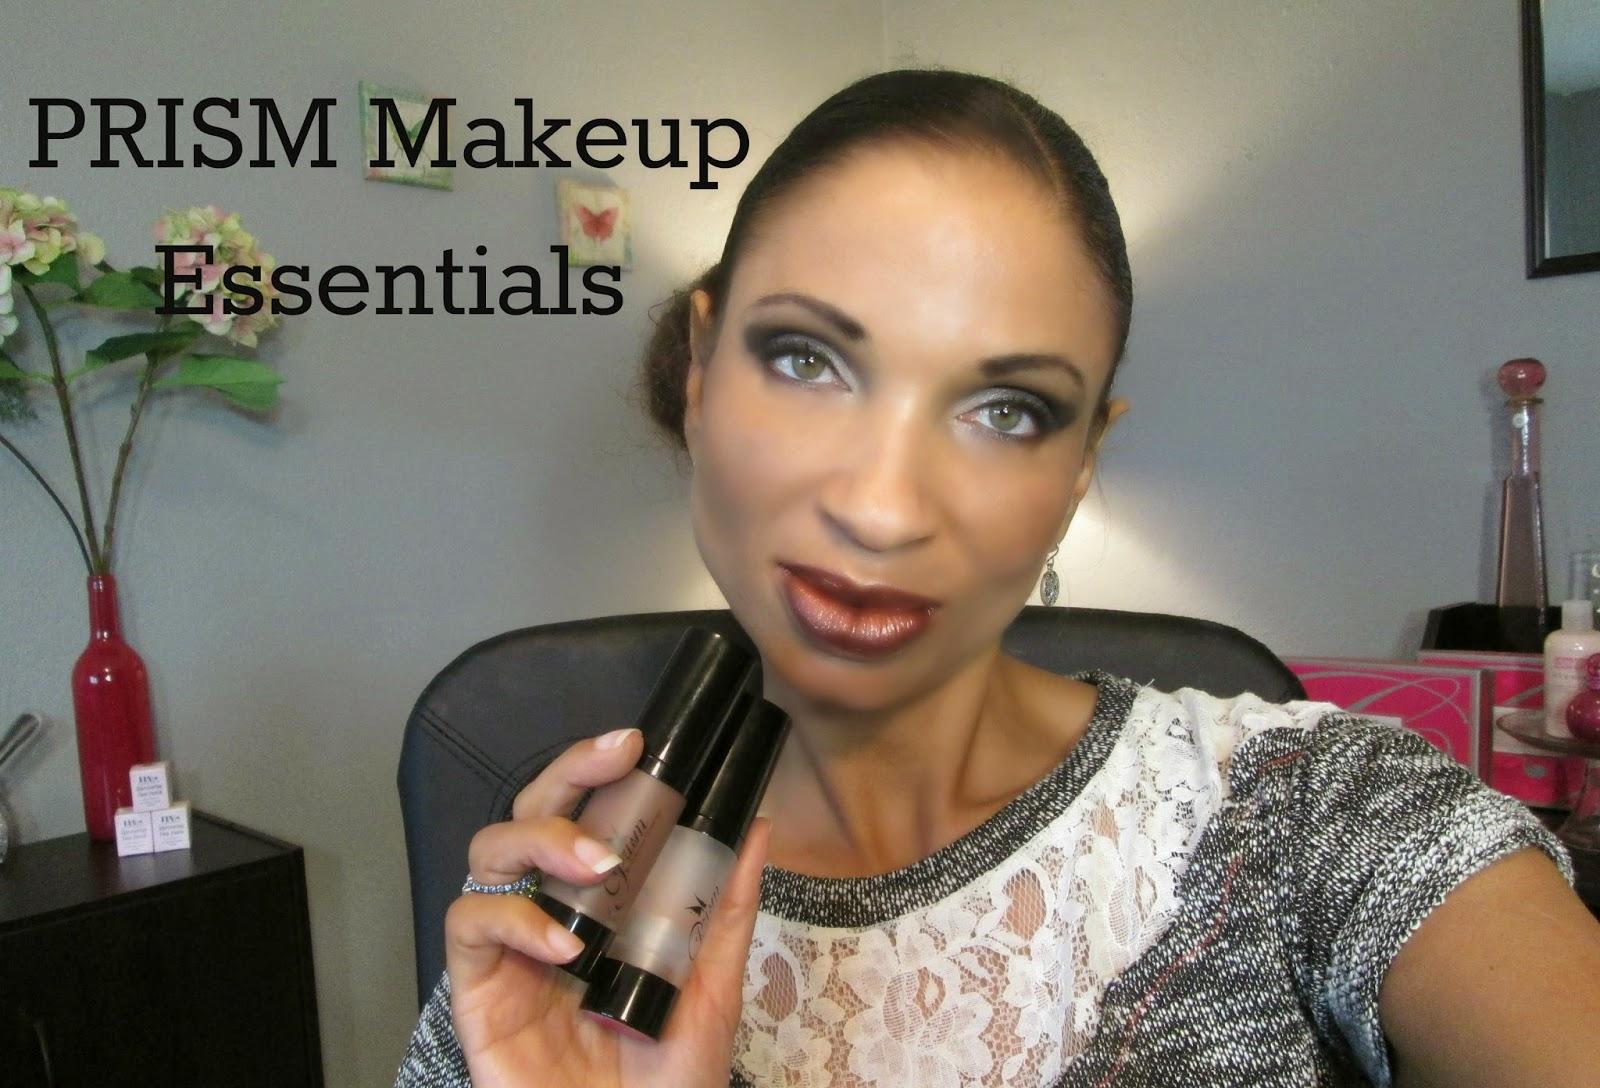 http://chrysalisspotlight.blogspot.com/2014/11/prism-makeup-essentials.html